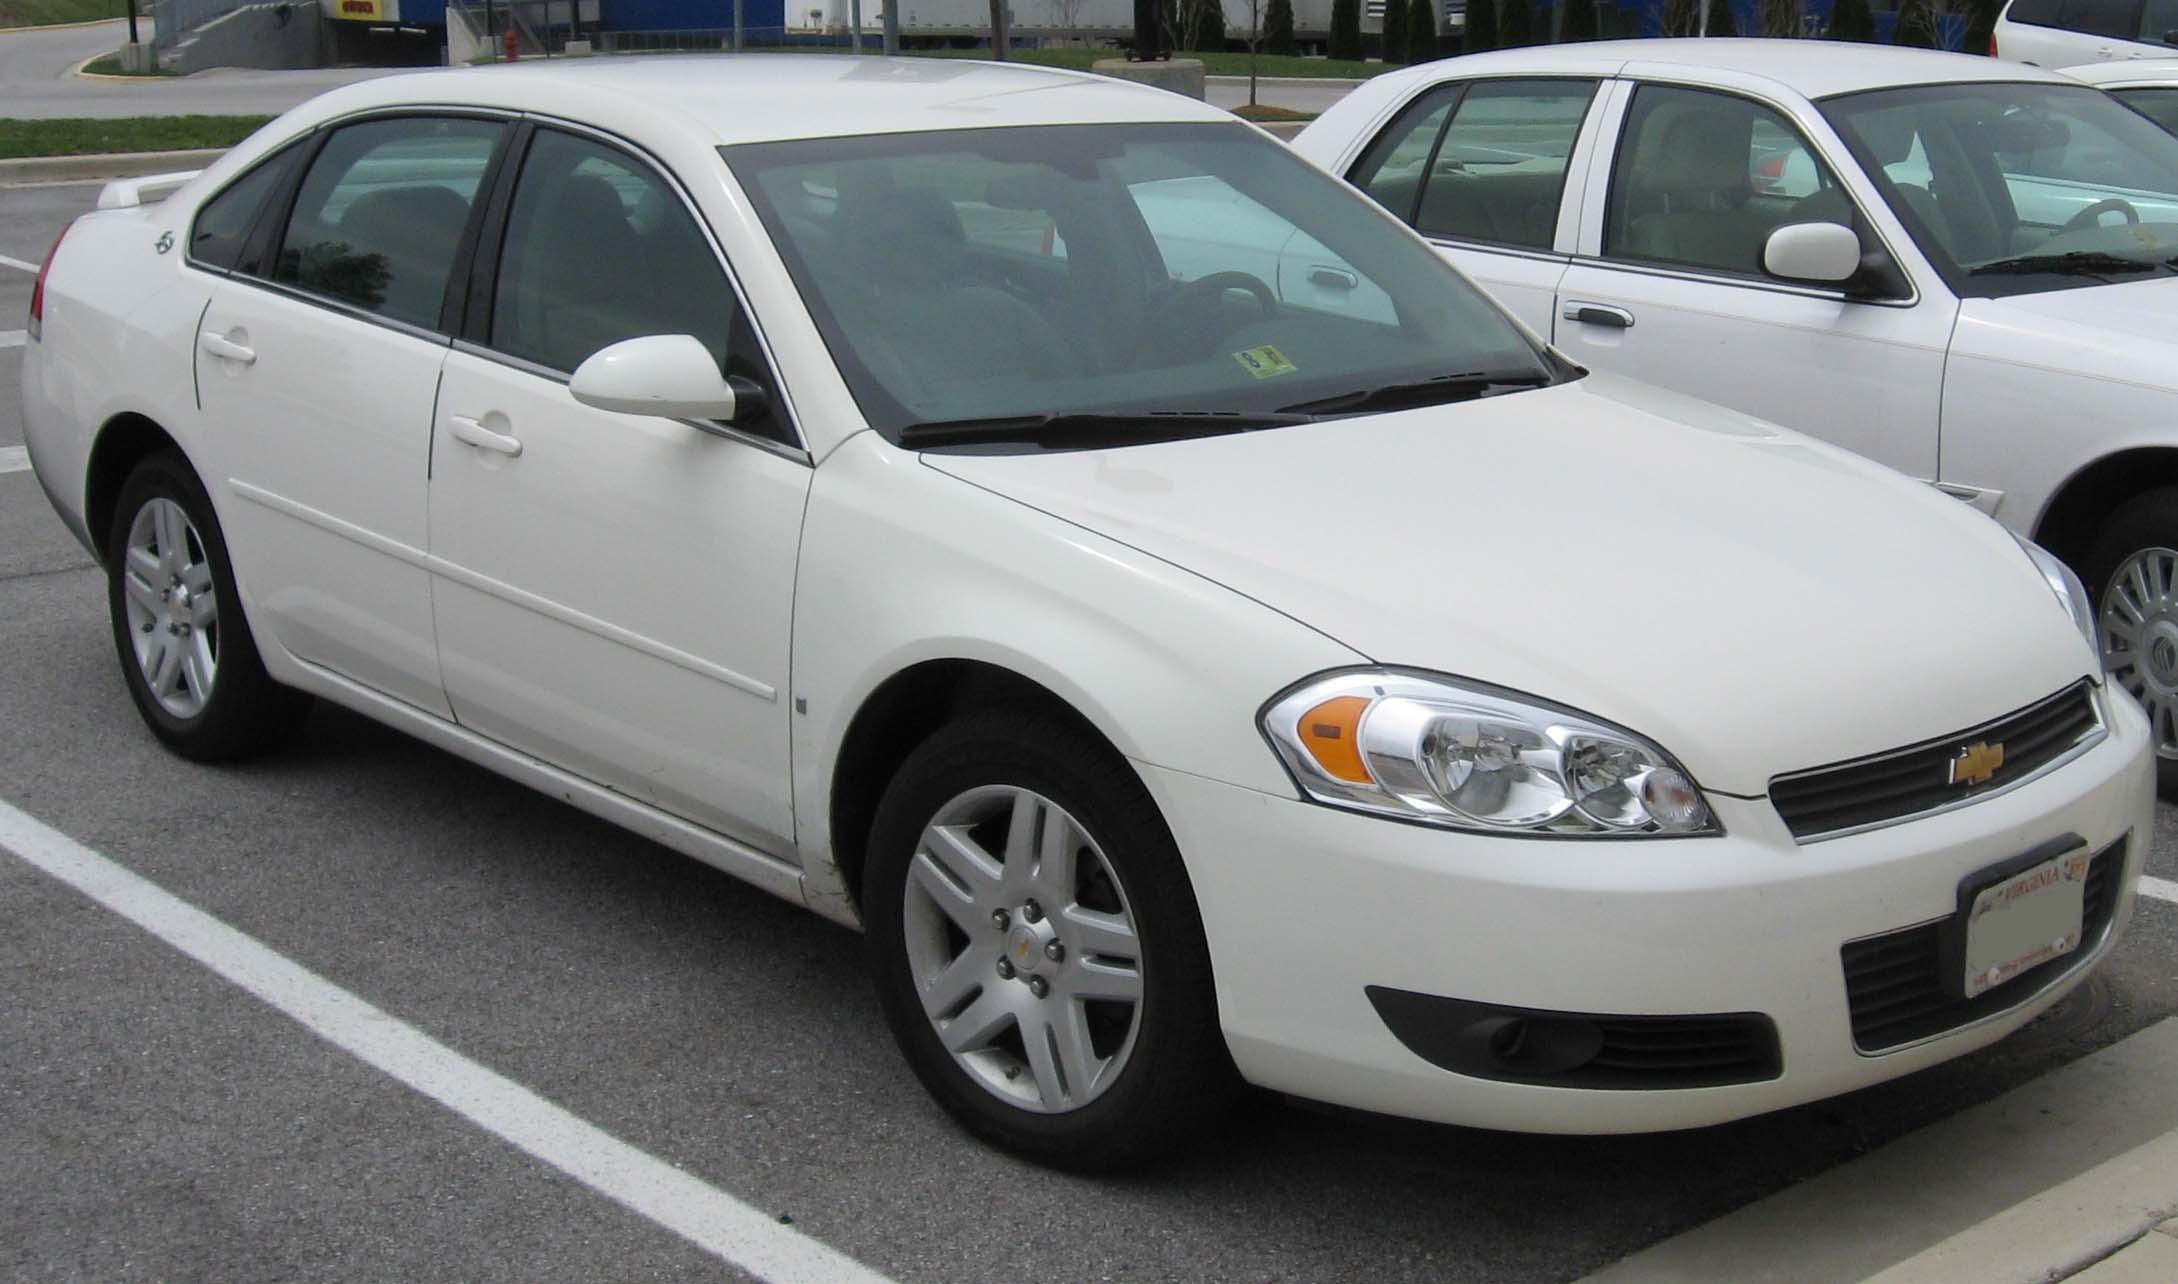 Used Impala Police Cars For Sale